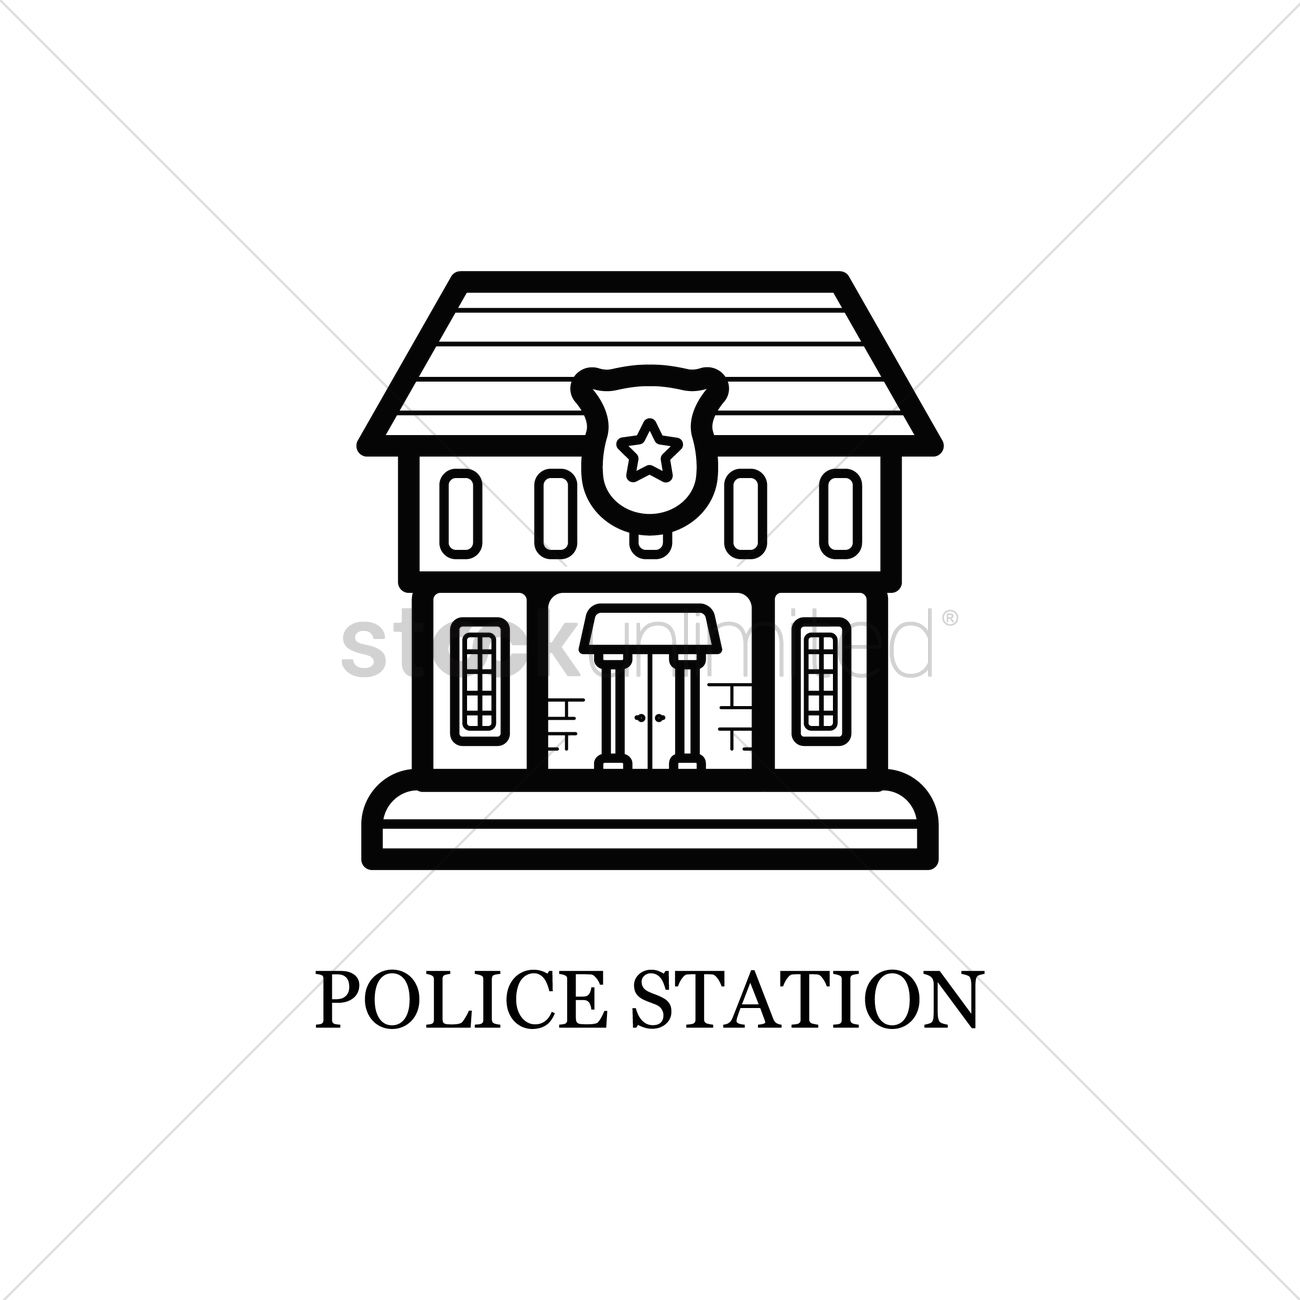 Police Station Black And White | www.pixshark.com - Images ... Police Station Building Clipart Black And White